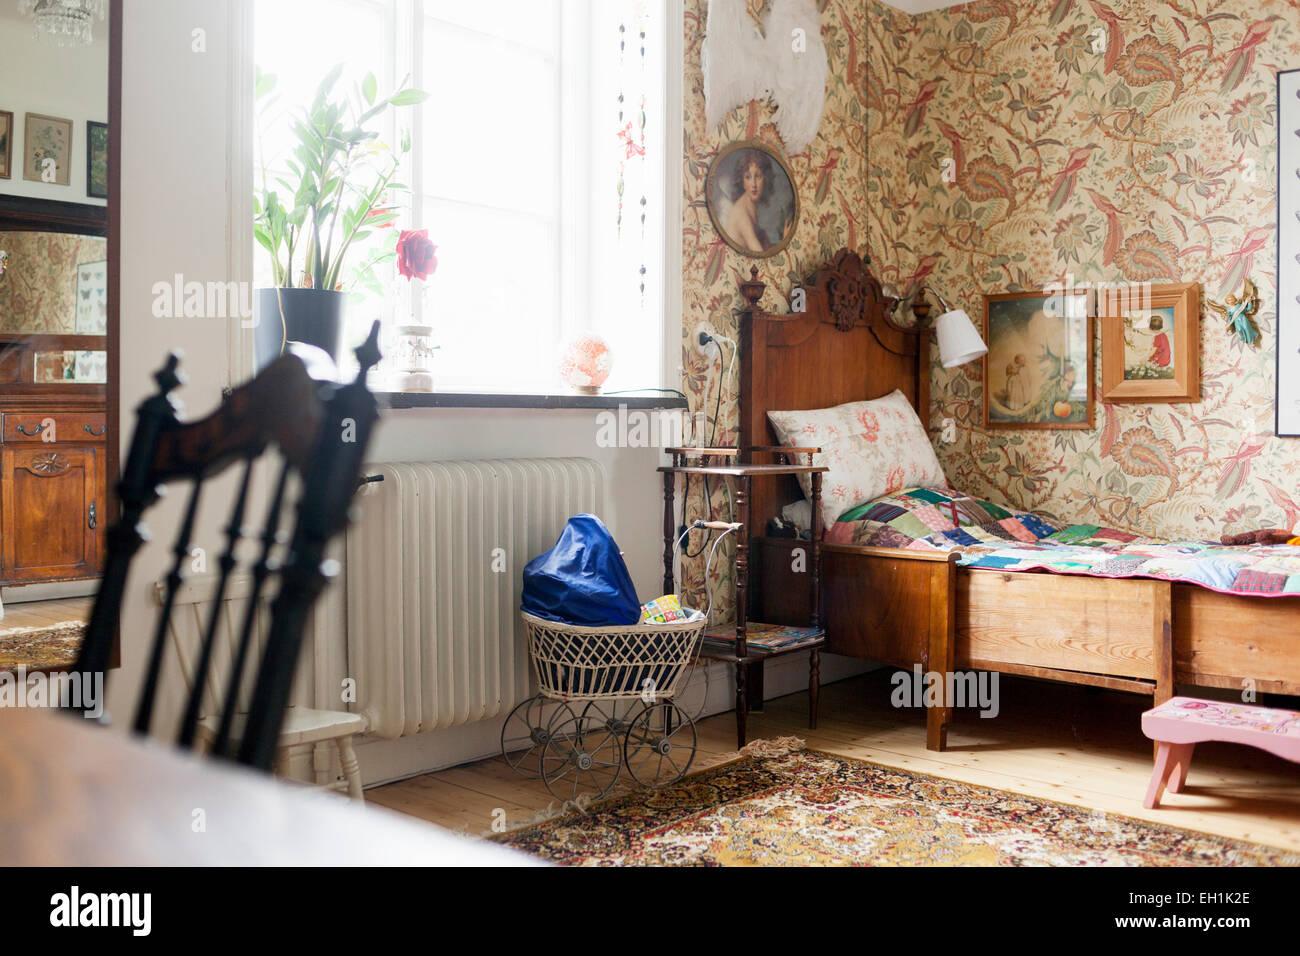 Simple House Stockfotos & Simple House Bilder - Alamy